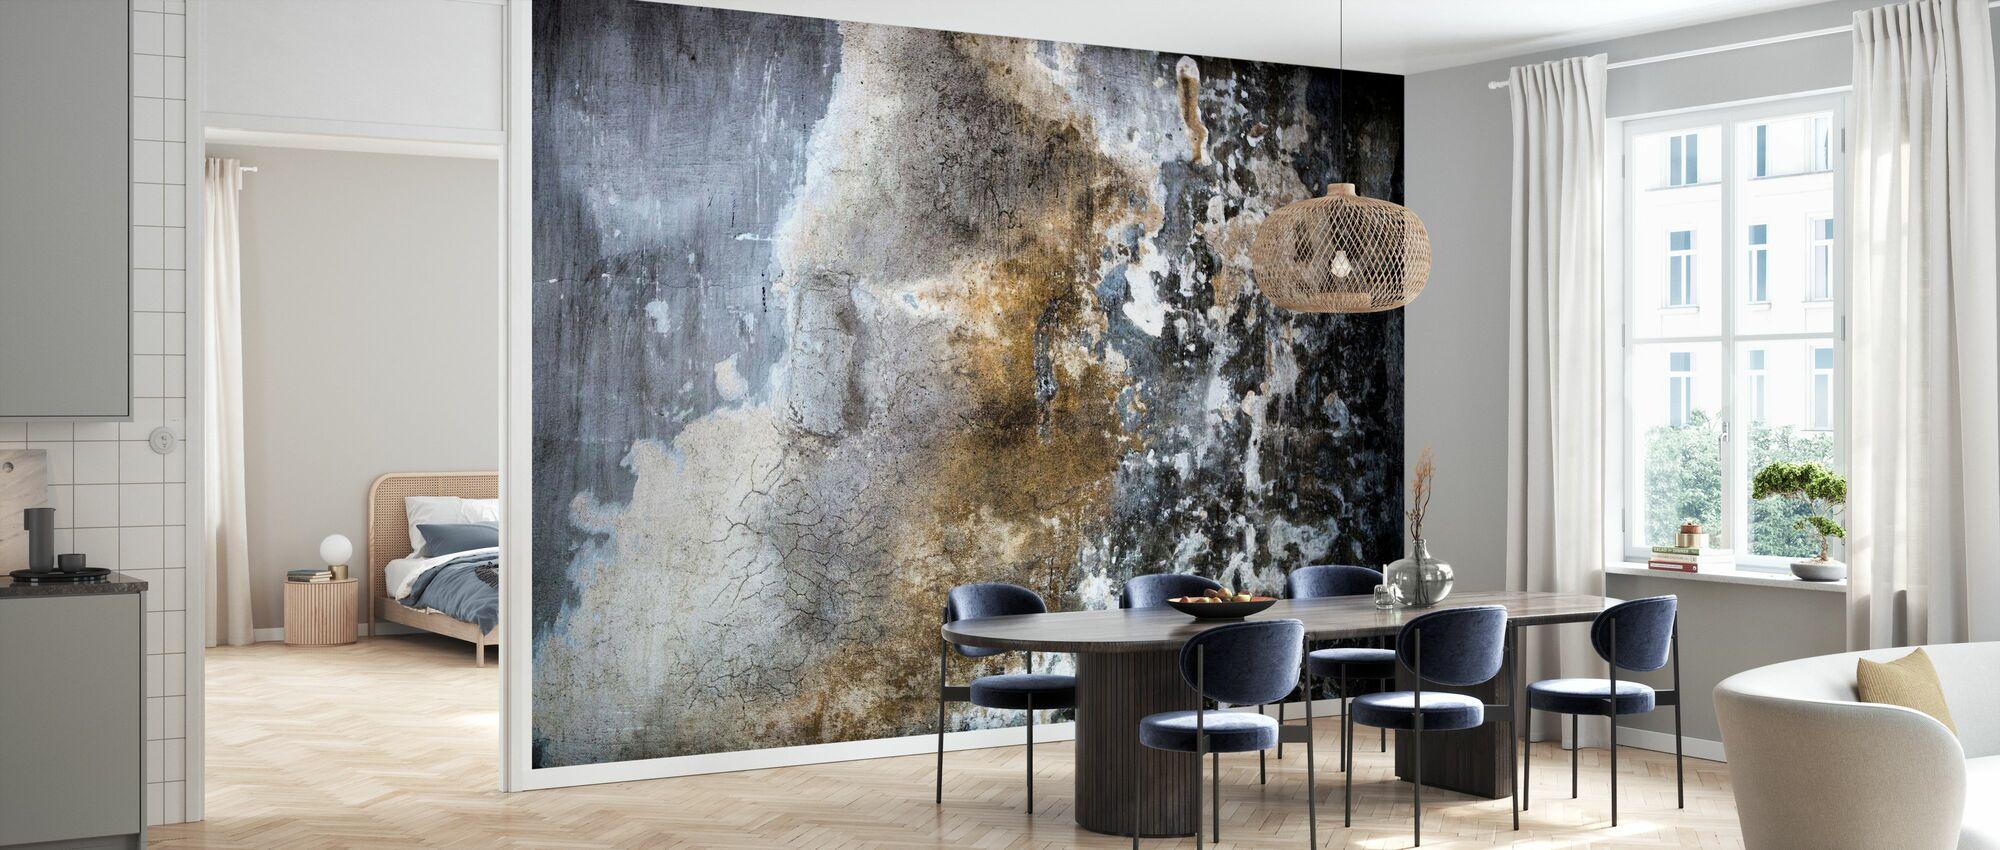 Grunge Wall - Wallpaper - Kitchen